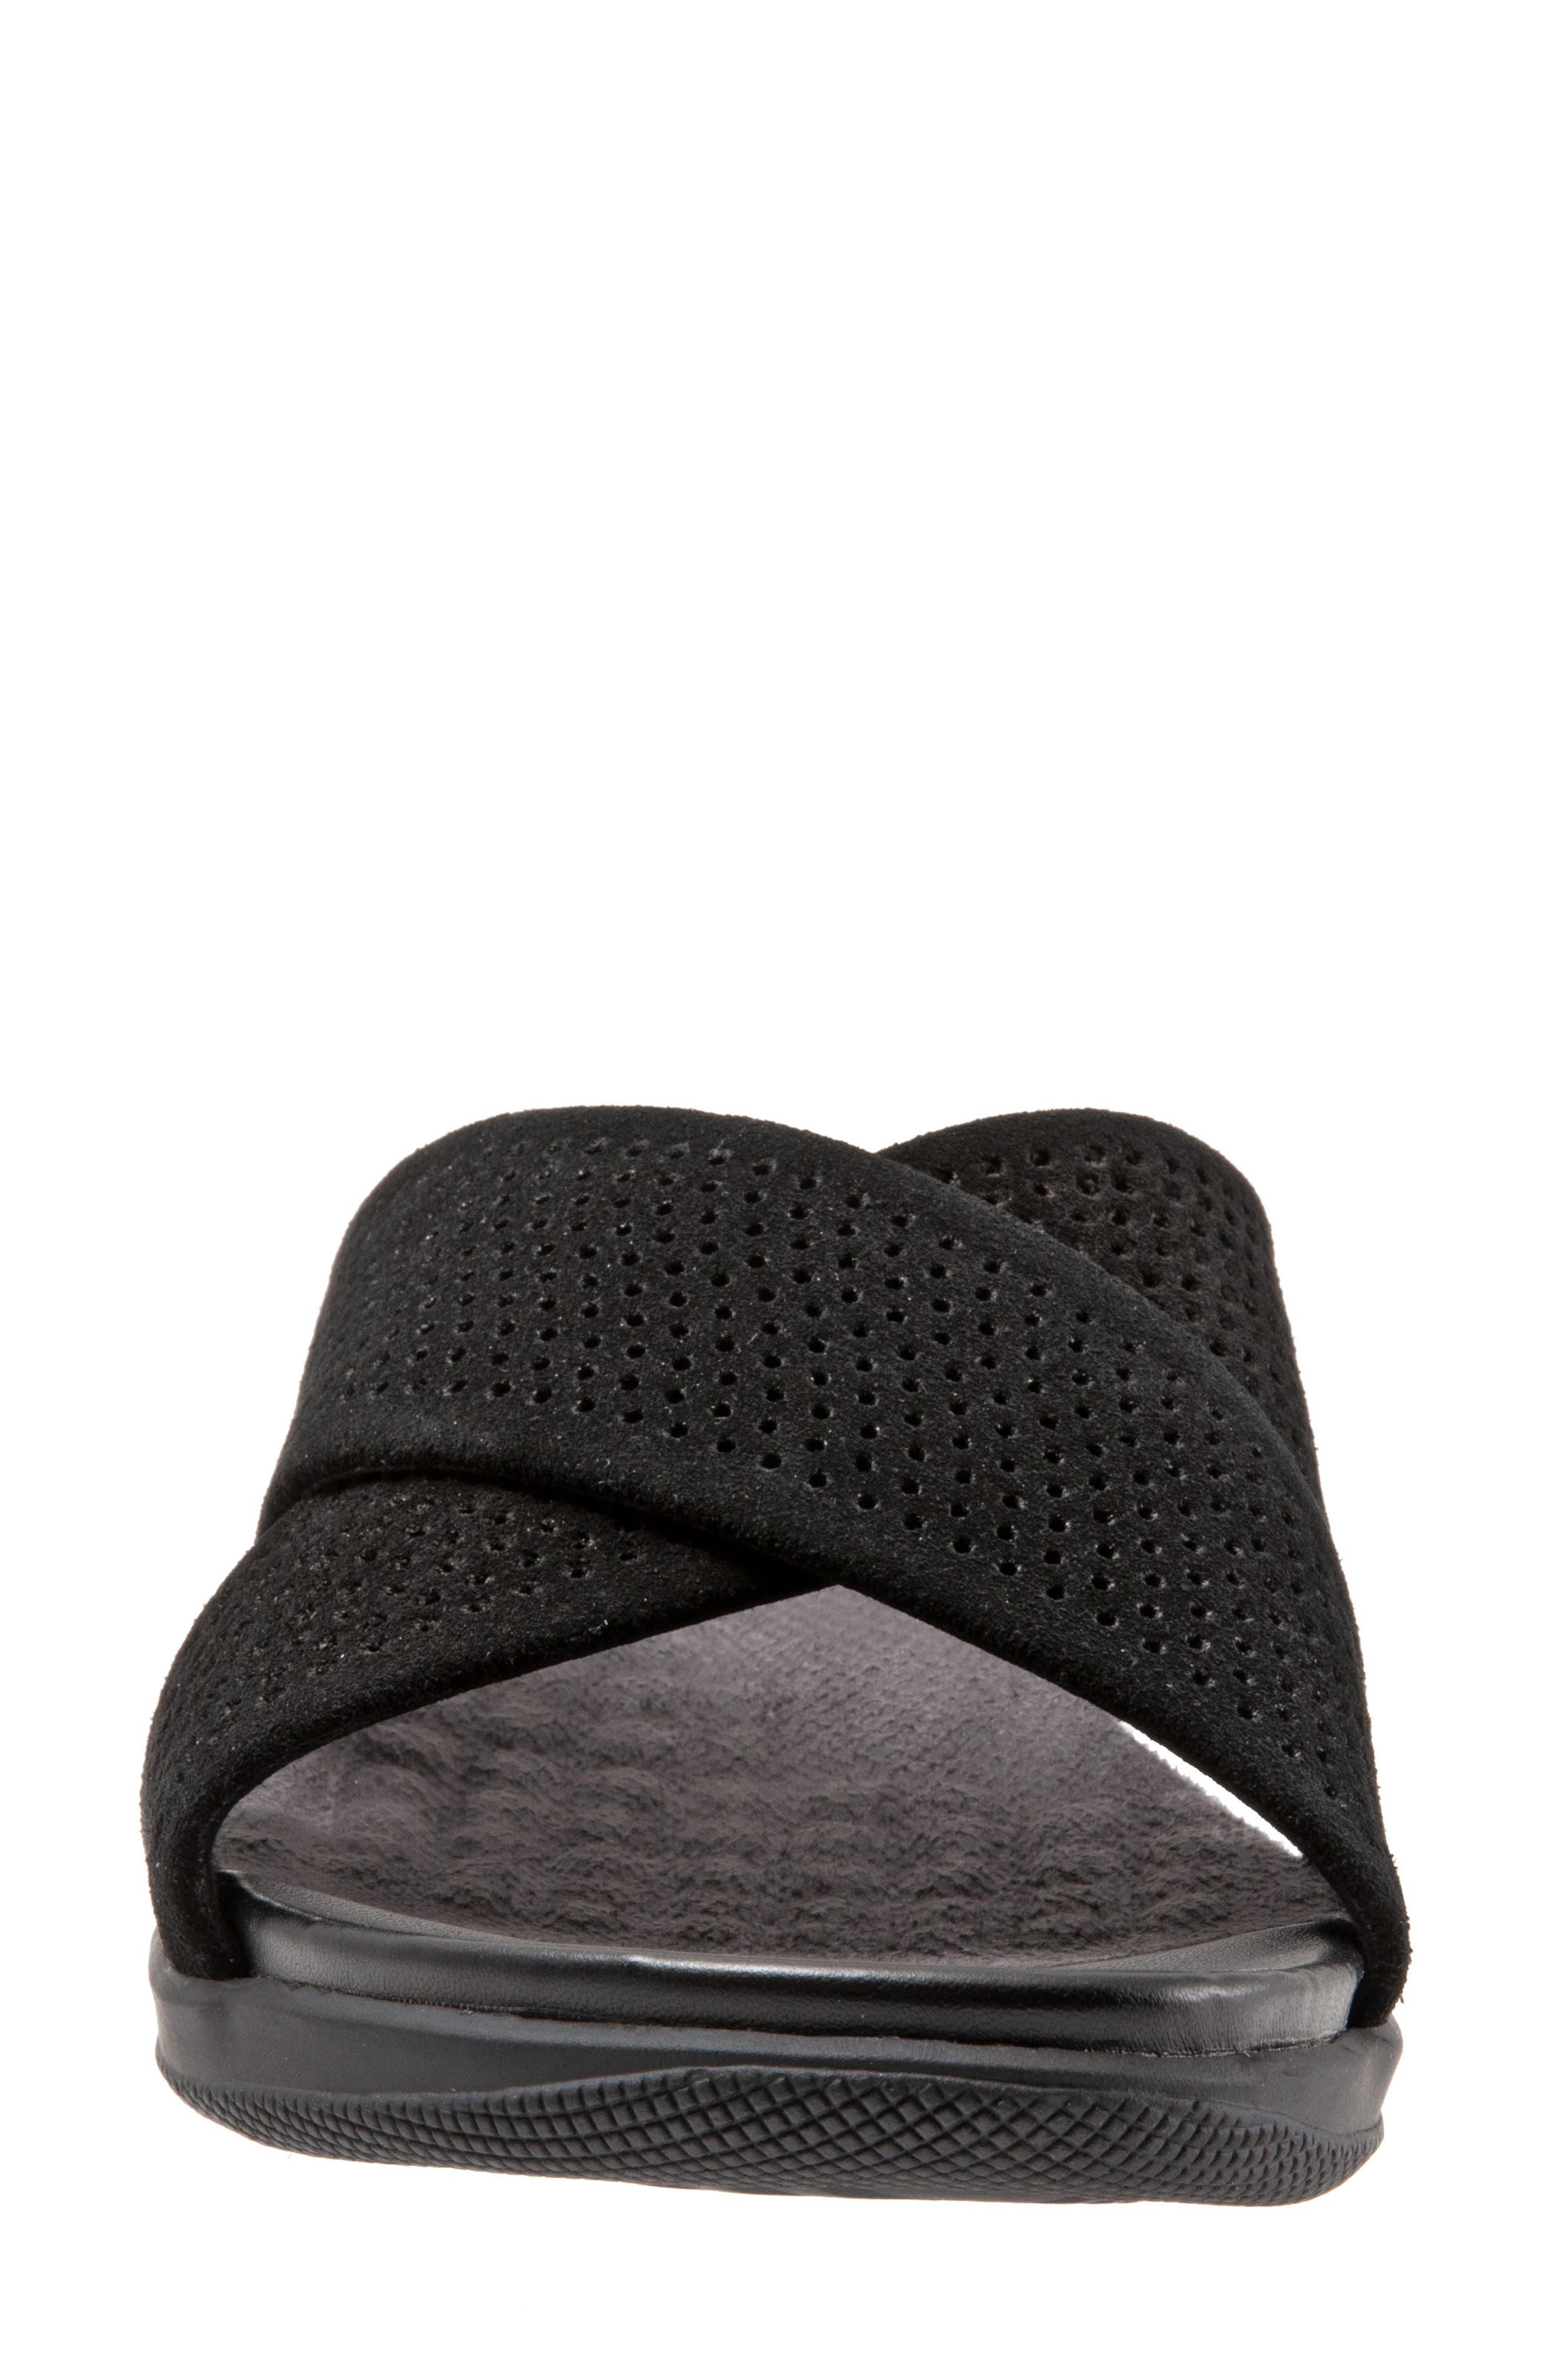 SOFTWALK<SUP>®</SUP>, 'Tillman' Leather Cross Strap Slide Sandal, Alternate thumbnail 4, color, 002